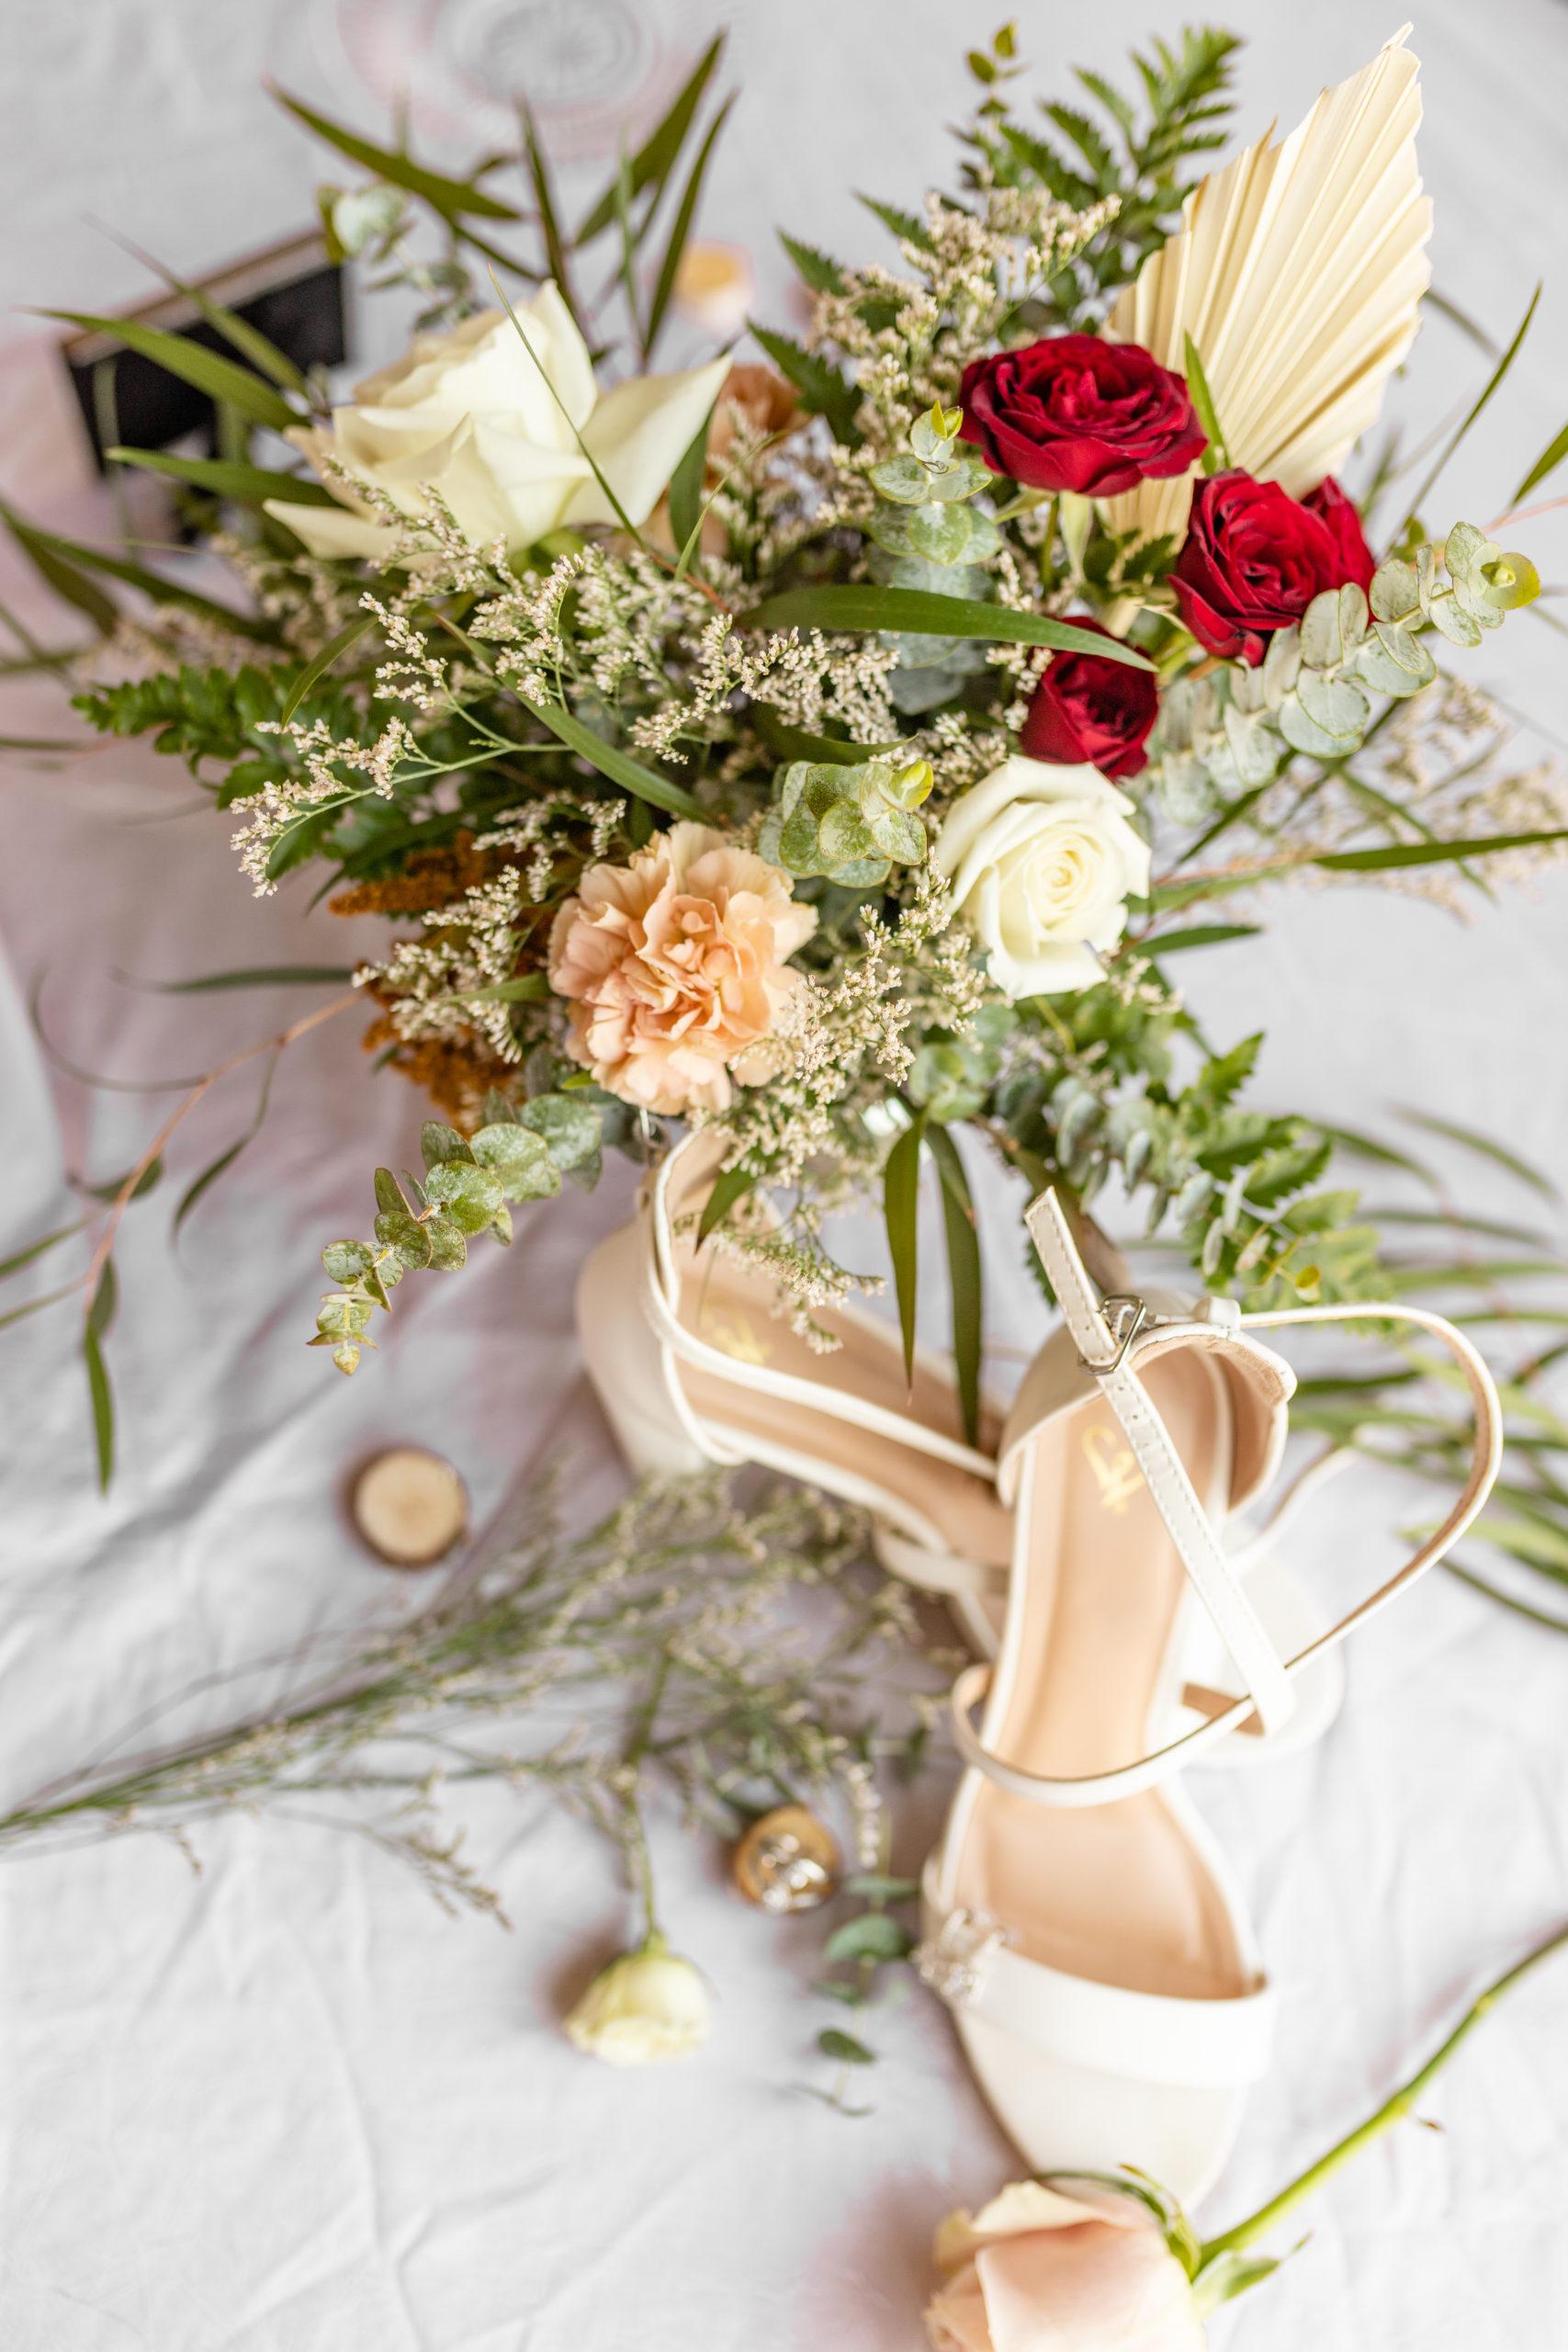 wedding photography, elegant boho bouquet, wedding bouquet, deliciously ordinary, wedding flowers, wedding details, garden grove, carbondale, southern Illinois wedding